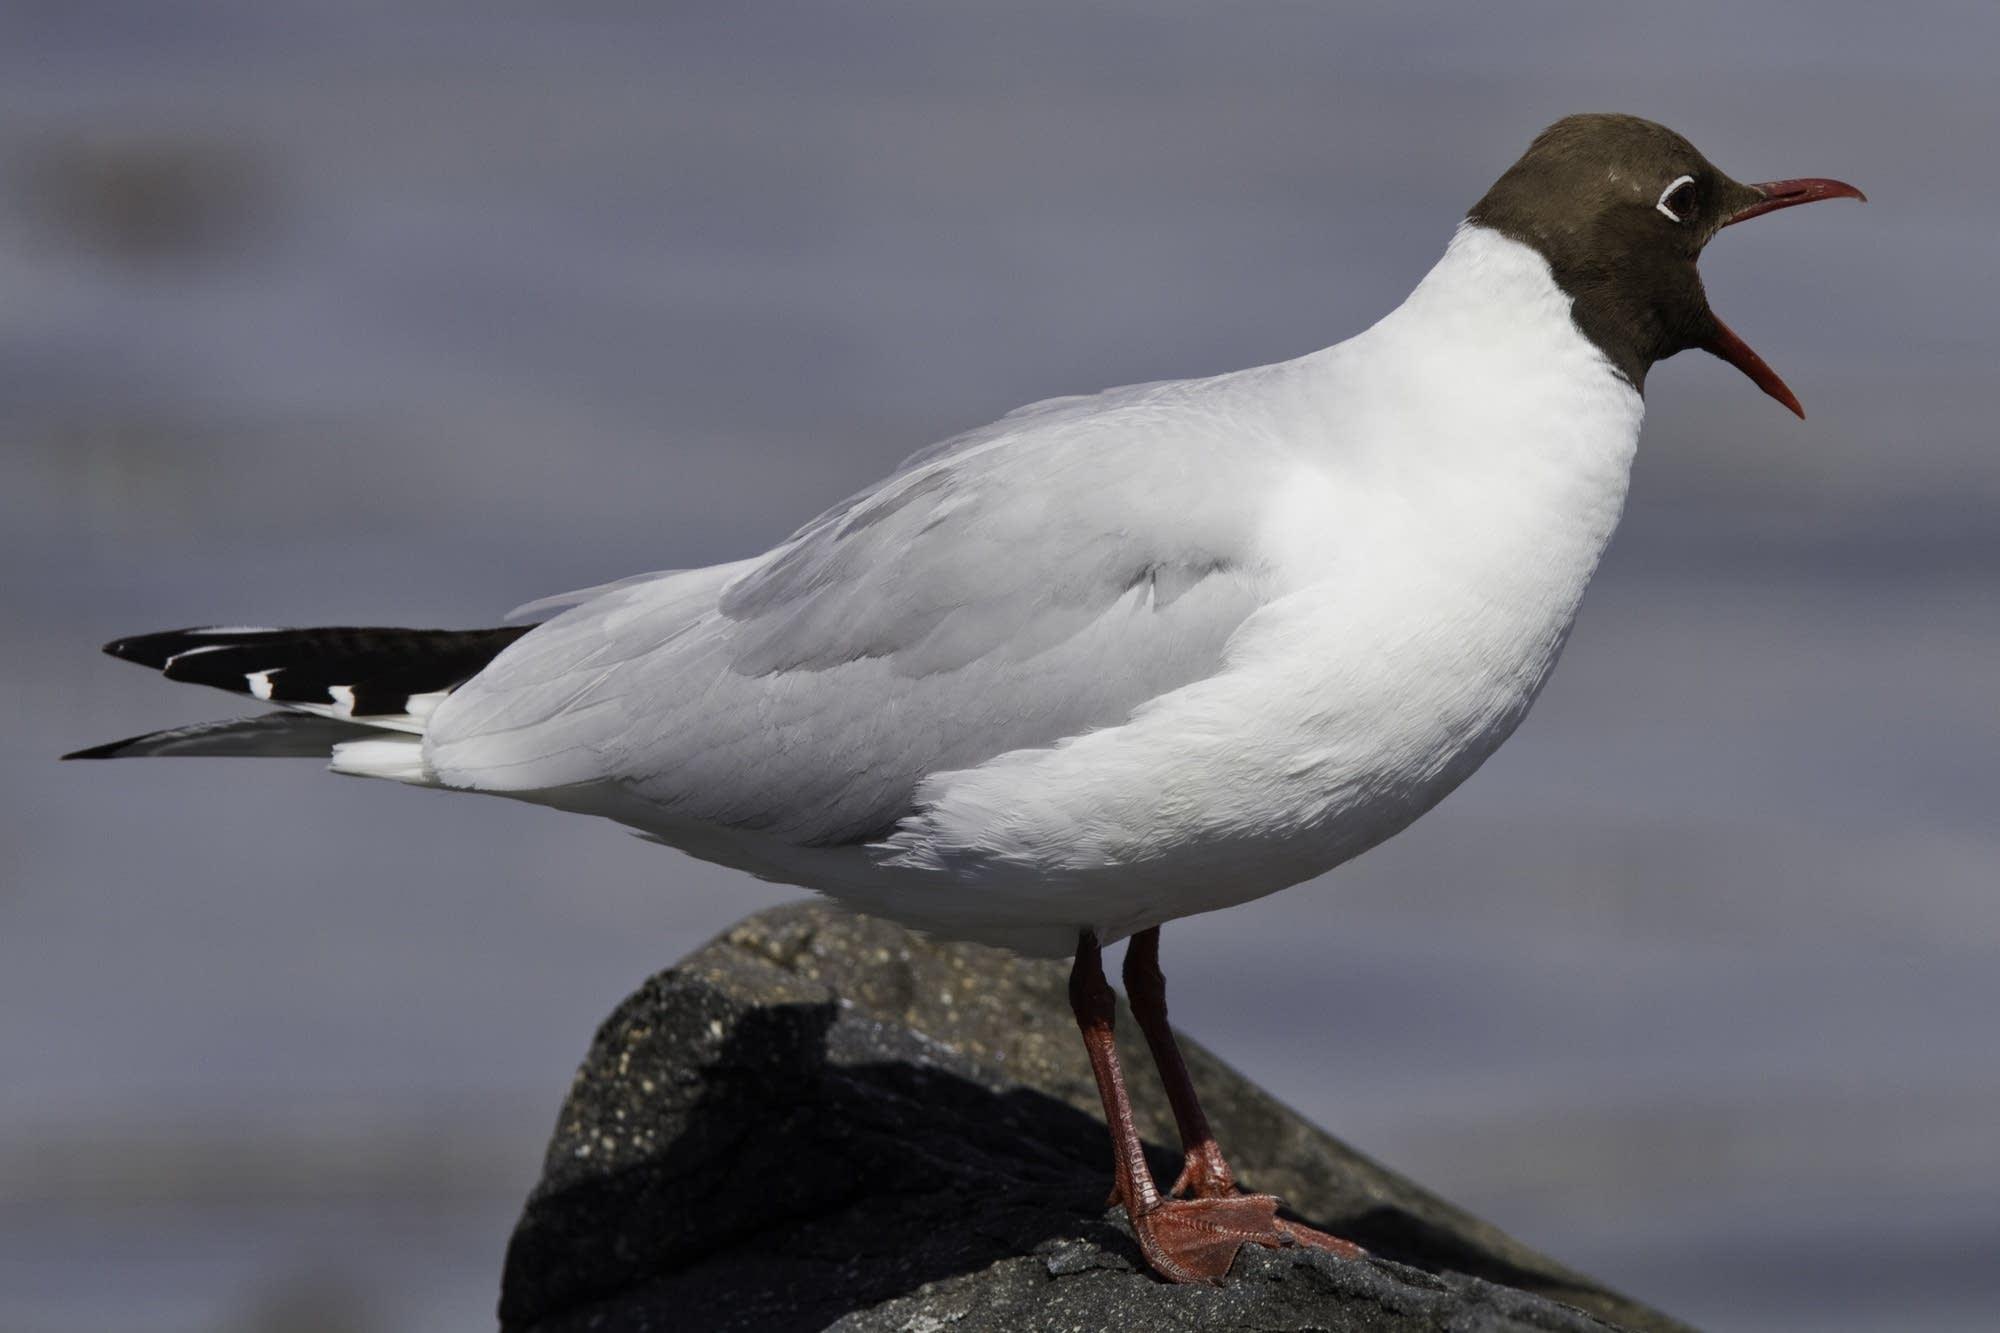 Oslo - 28 - bird with open beak